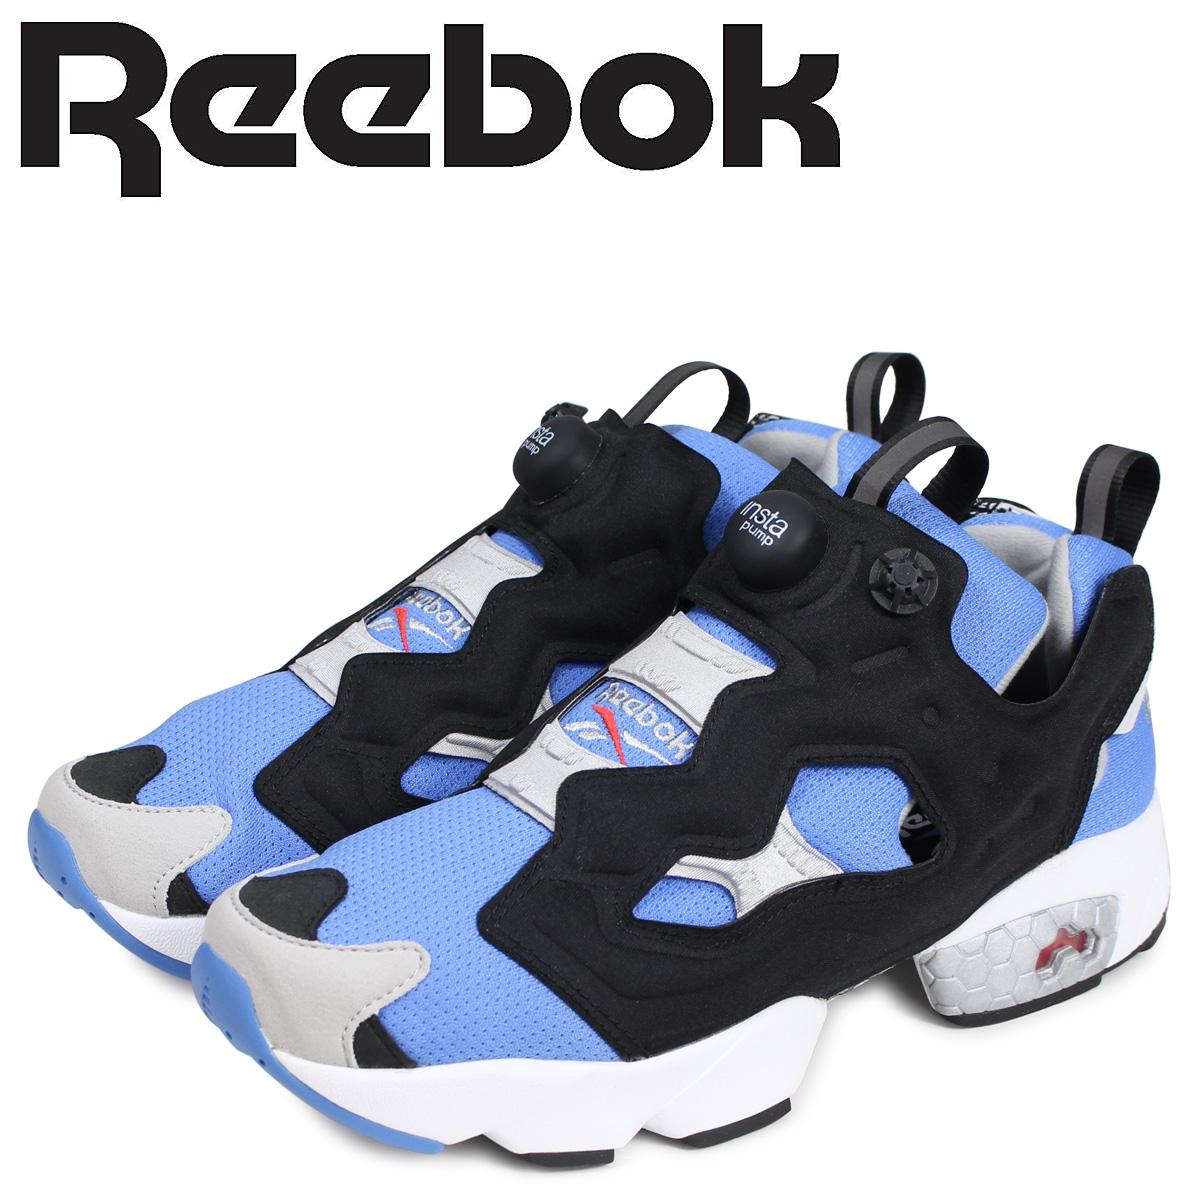 Reebok リーボック インスタ ポンプフューリー スニーカー メンズ INSTAPUMP FURY OG ブルー M48756